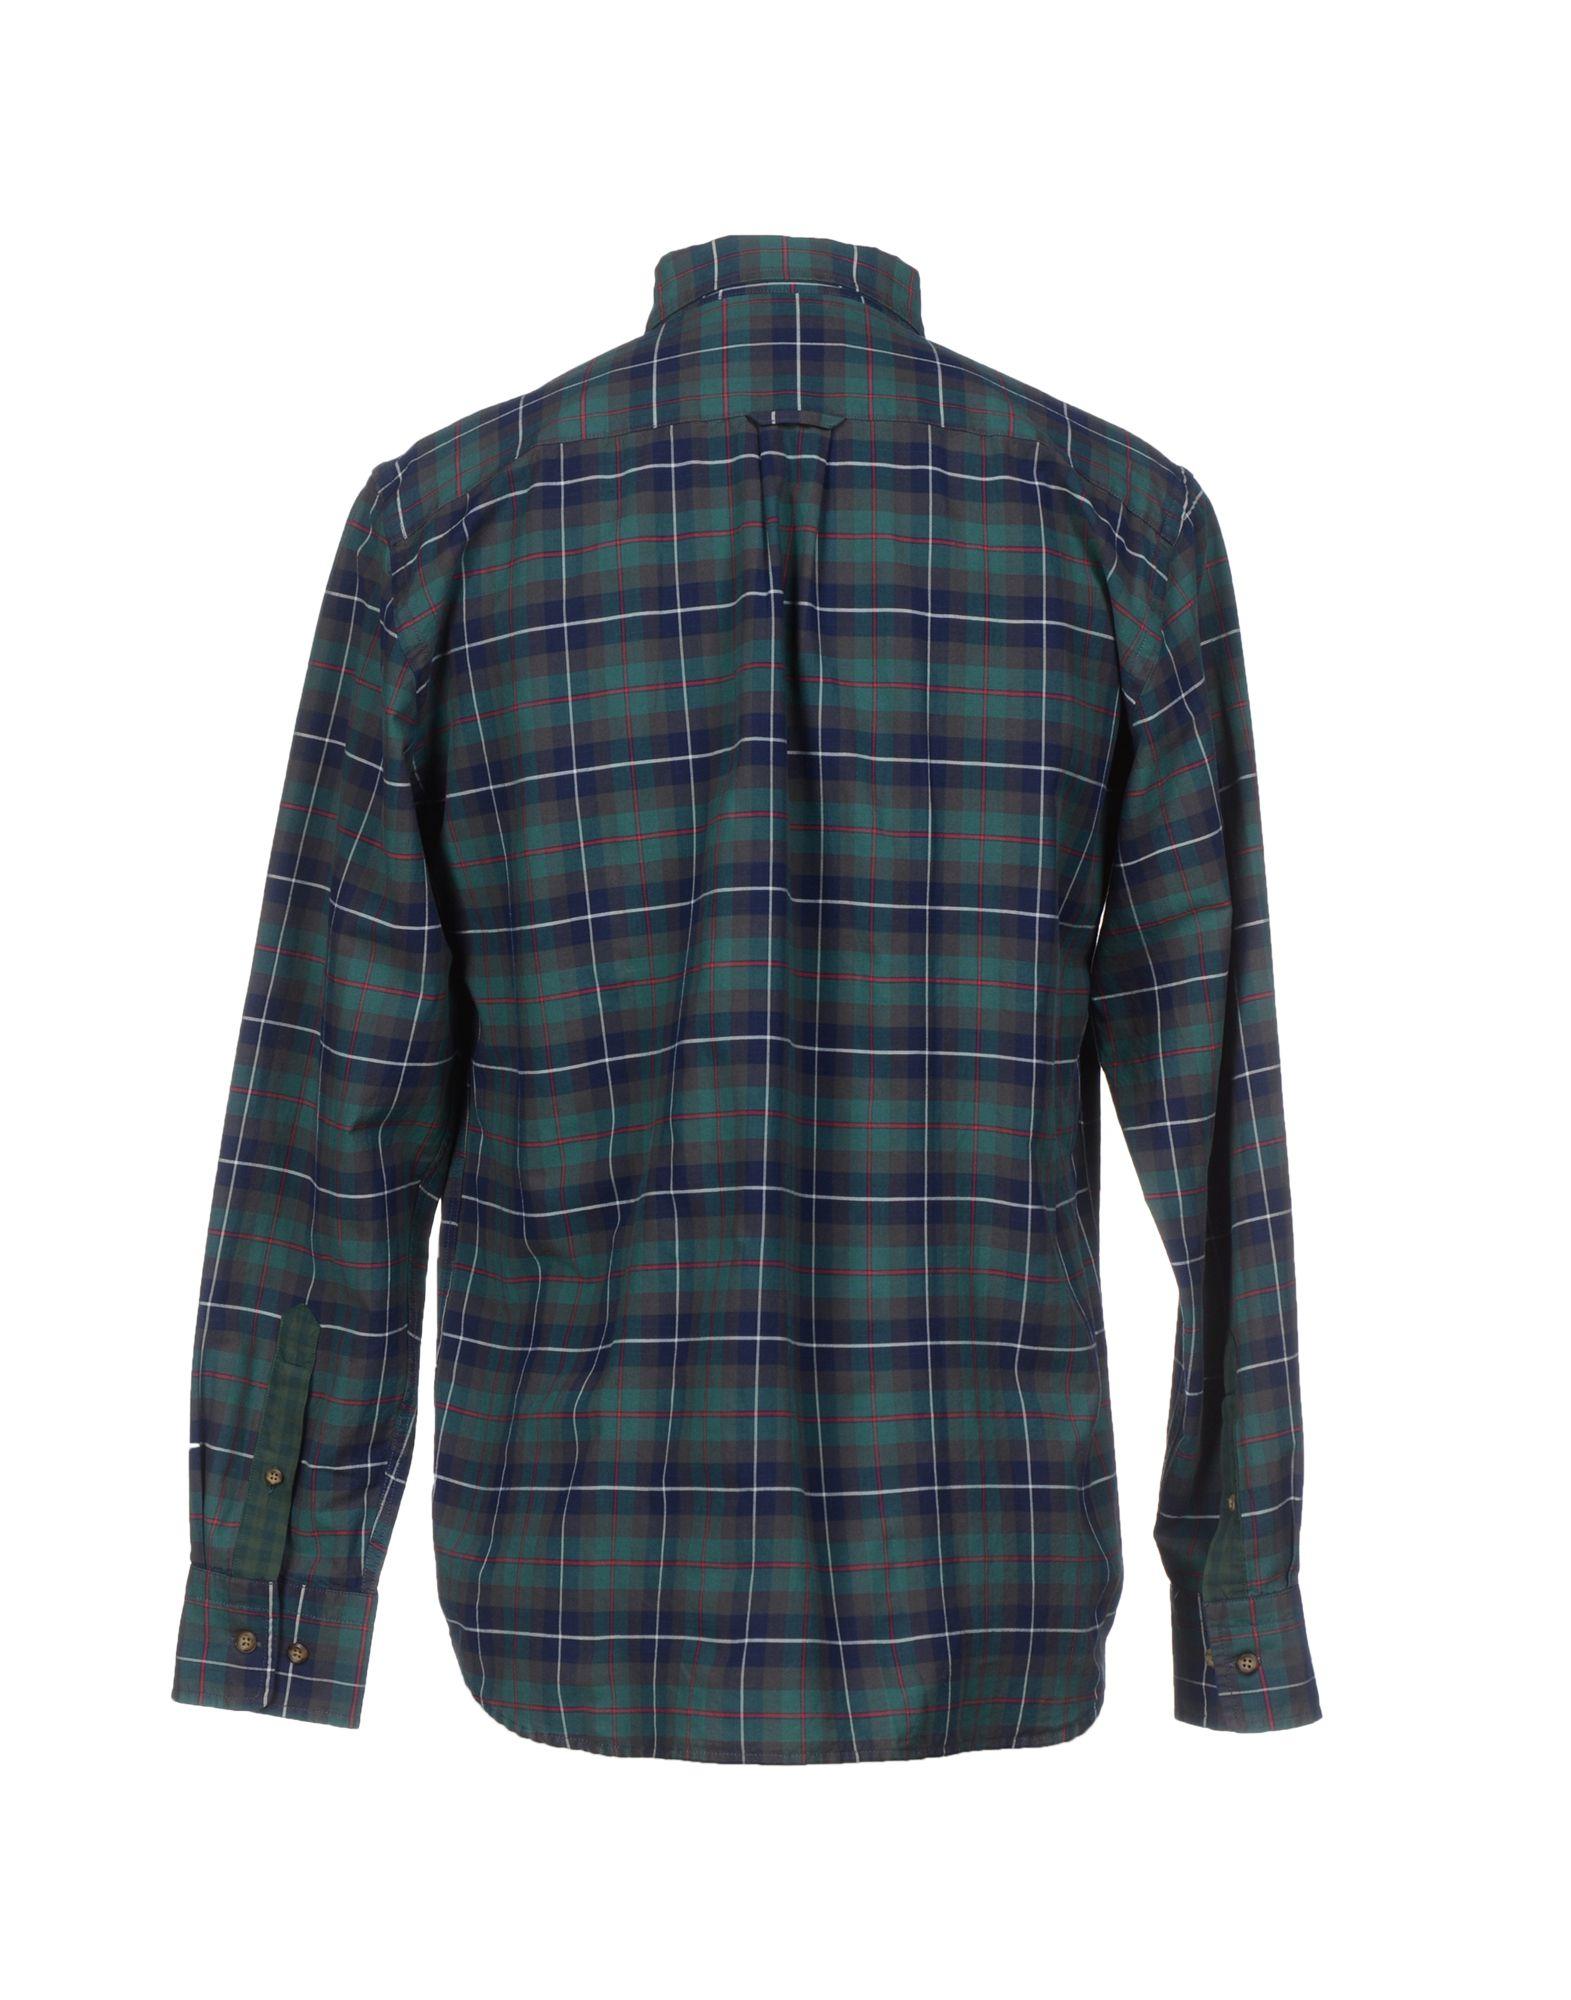 black single men in allendale Men's 2018 us open sunice black allendale thermal half-zip pullover jacket your price: $6999 women's 2018 us women's mid-amateur cutter.